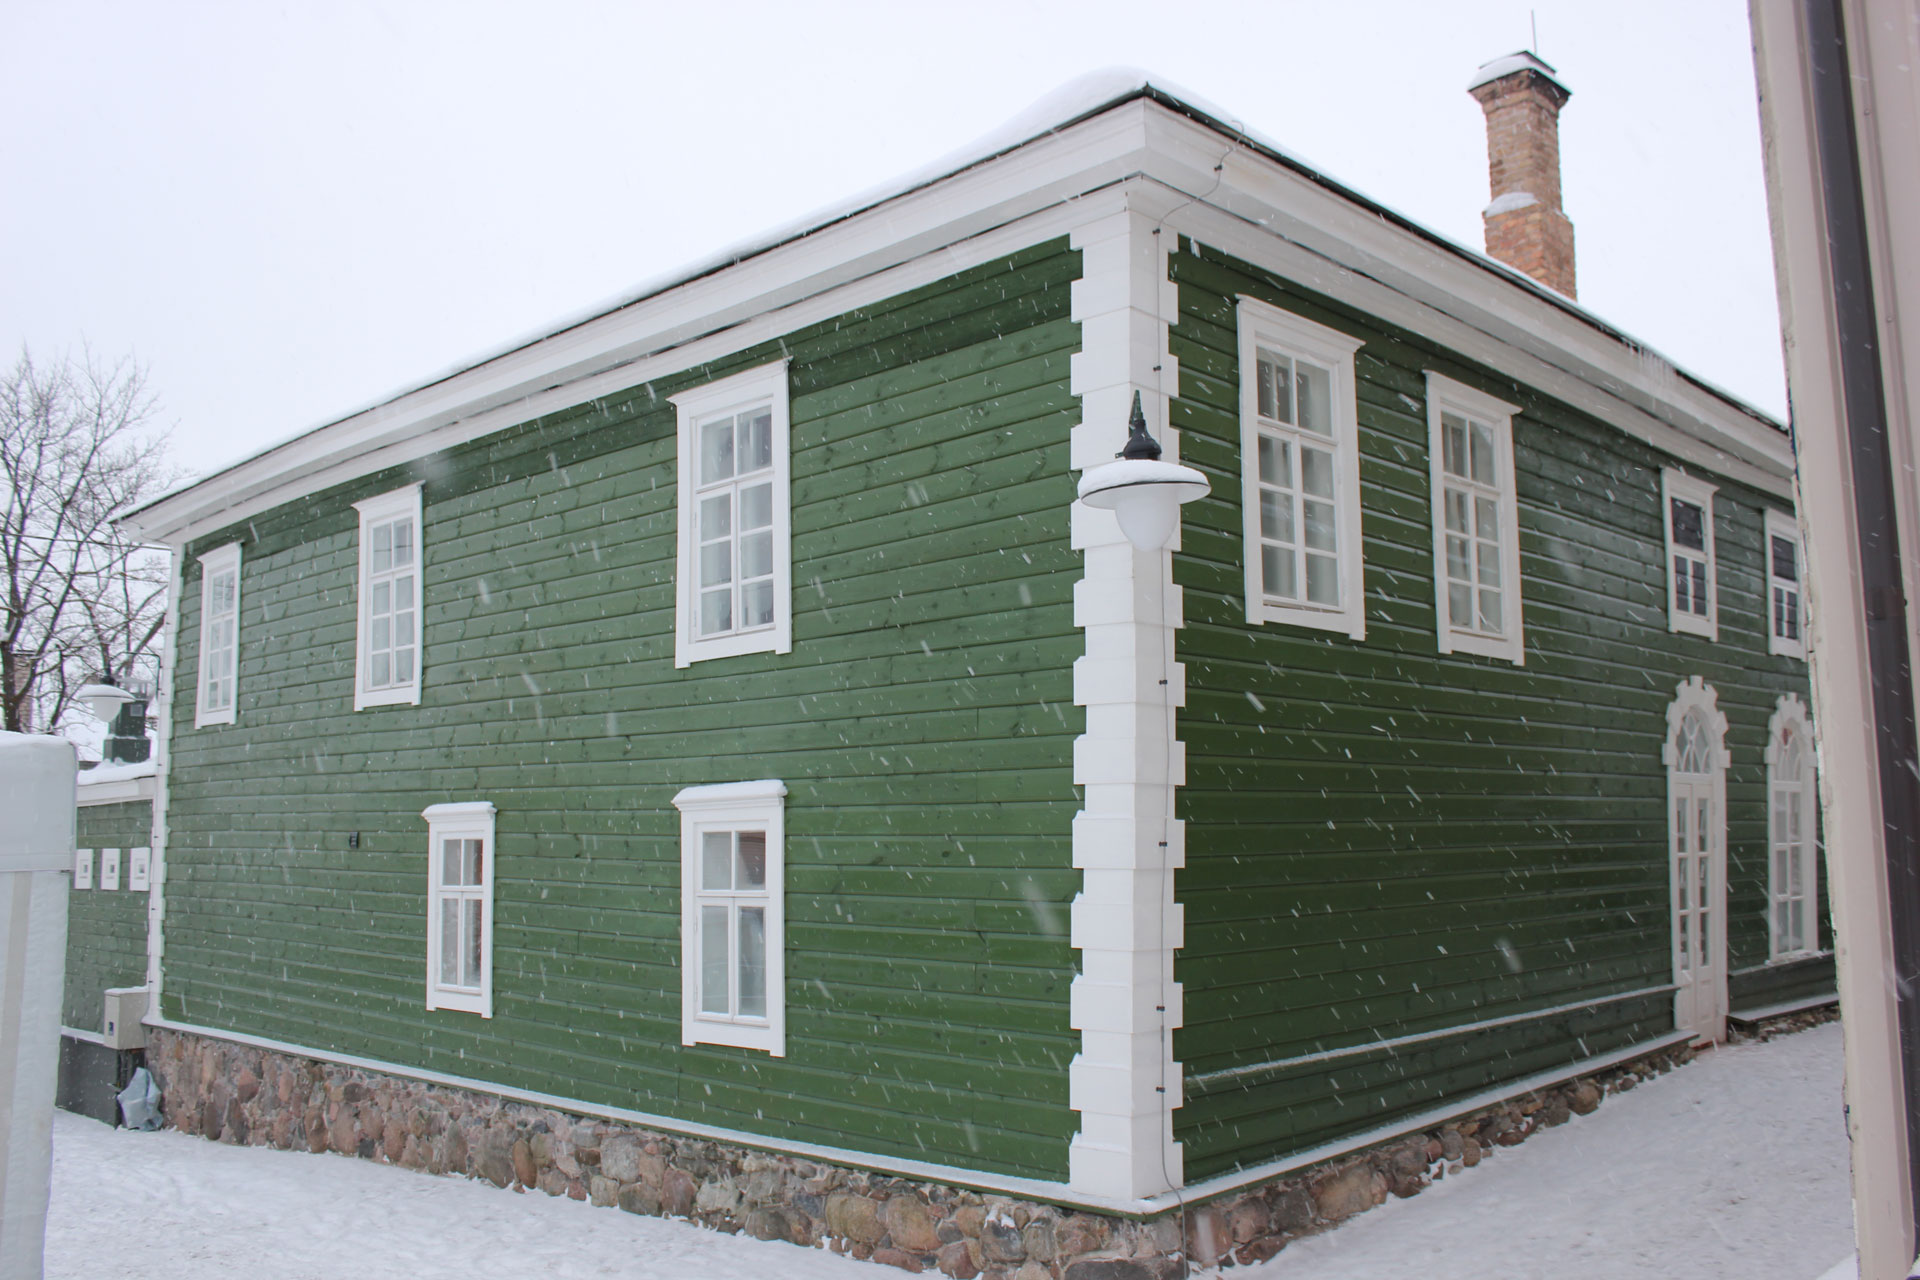 ETTER: Den grønne synagogen i januar 2016. Foto: Turid Årsheim Riksantikvaren